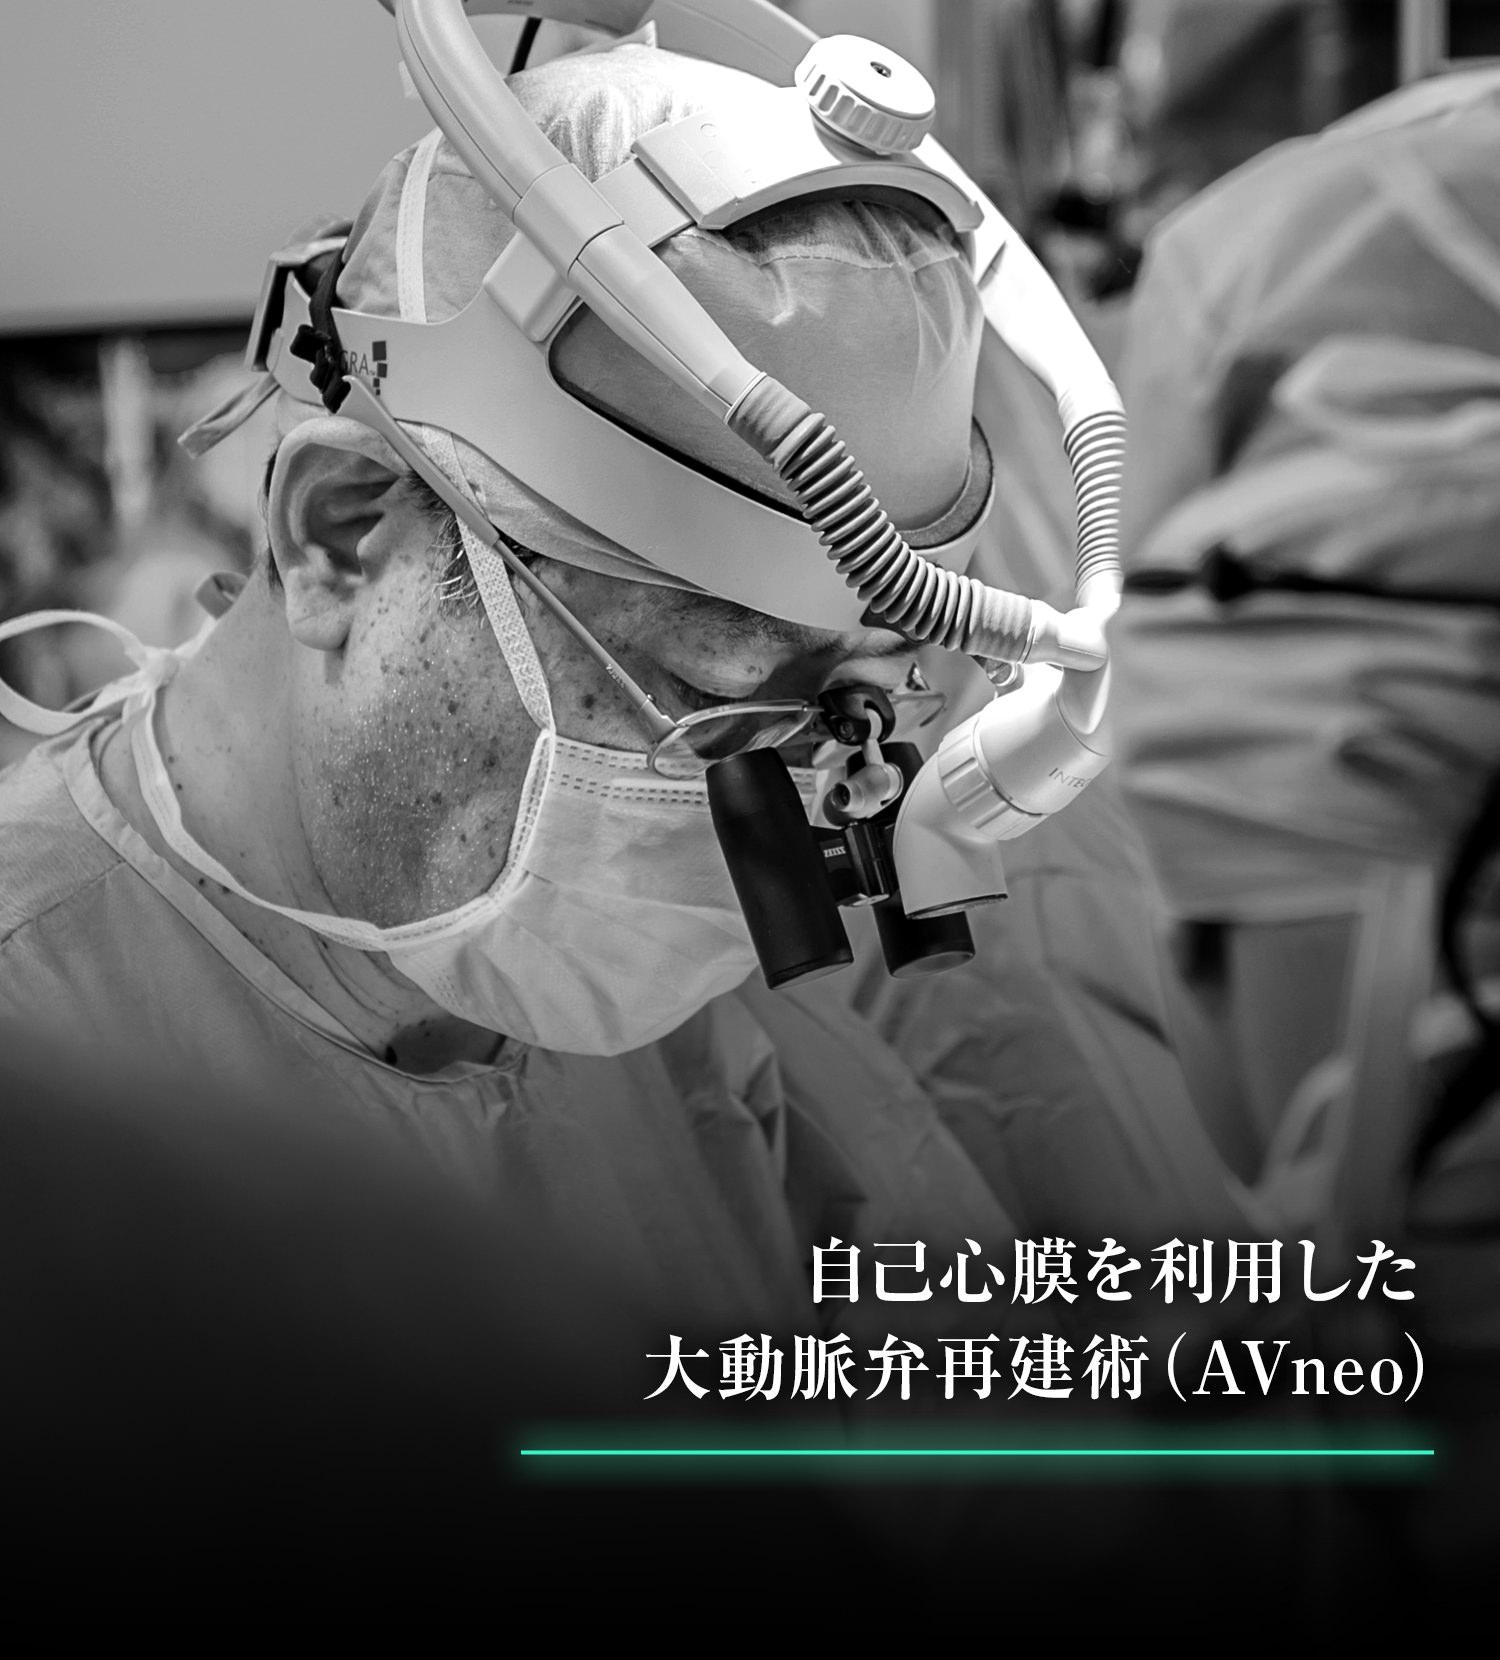 Pcr 病院 区 杉並 検査